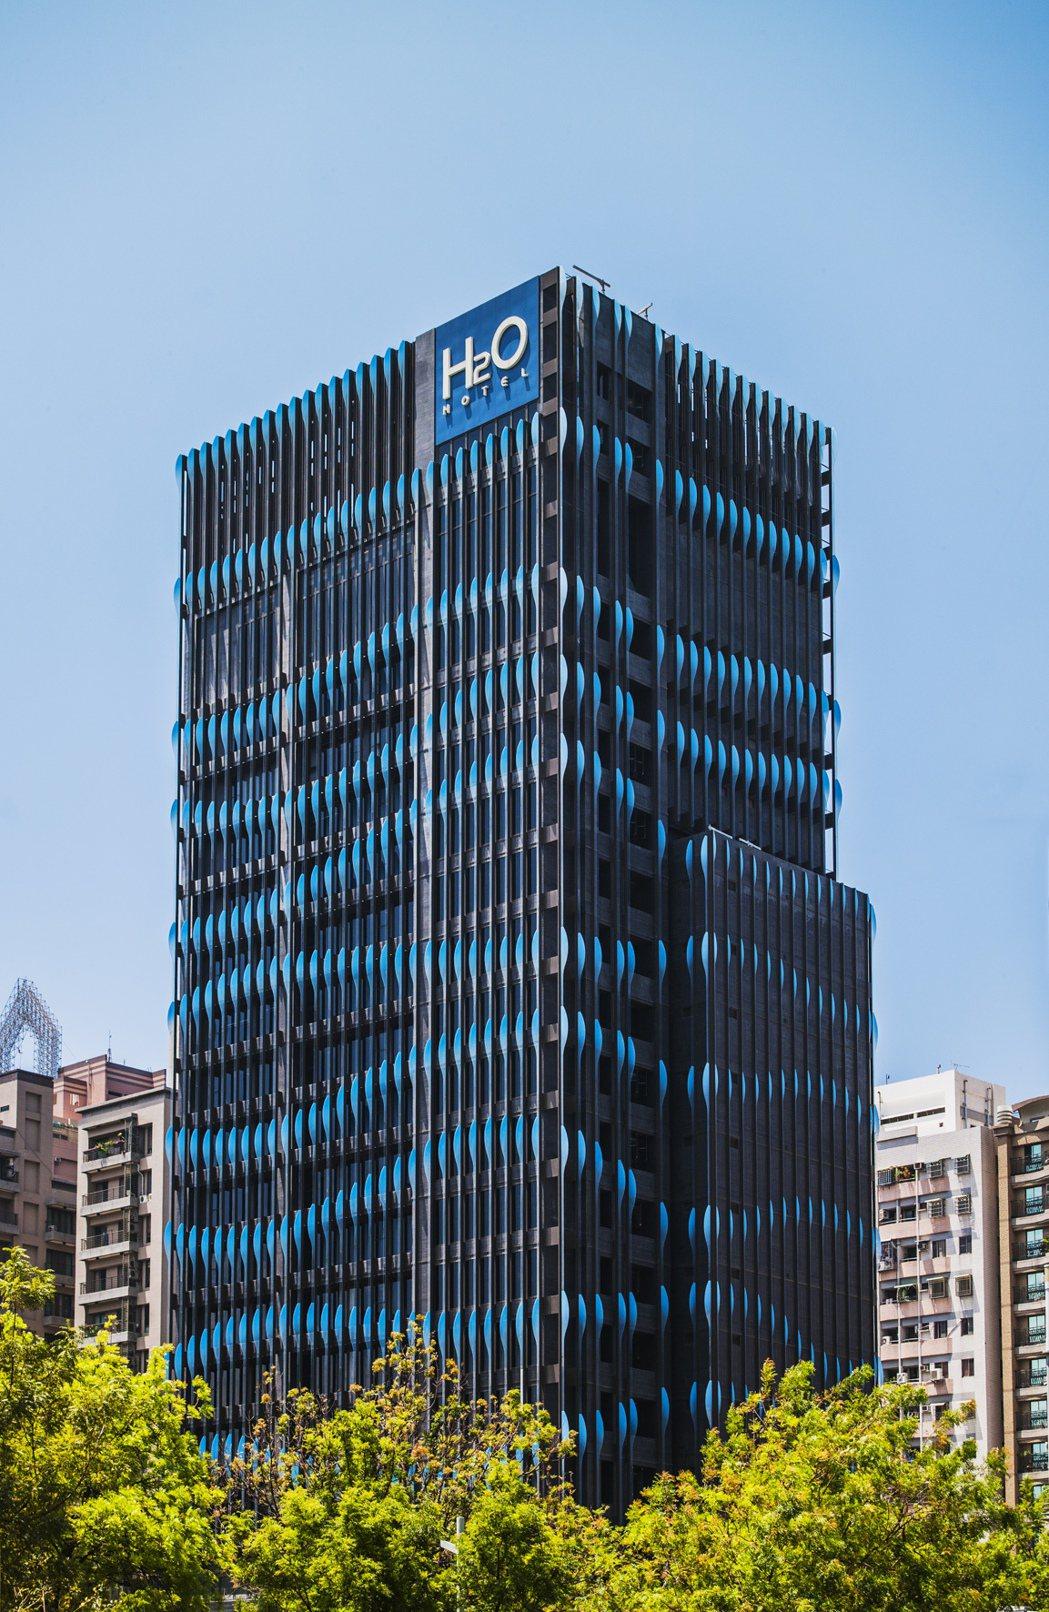 H2O水波外觀建築,及LED牆都是台灣唯一。 圖片提供/H2O水京棧國際酒店